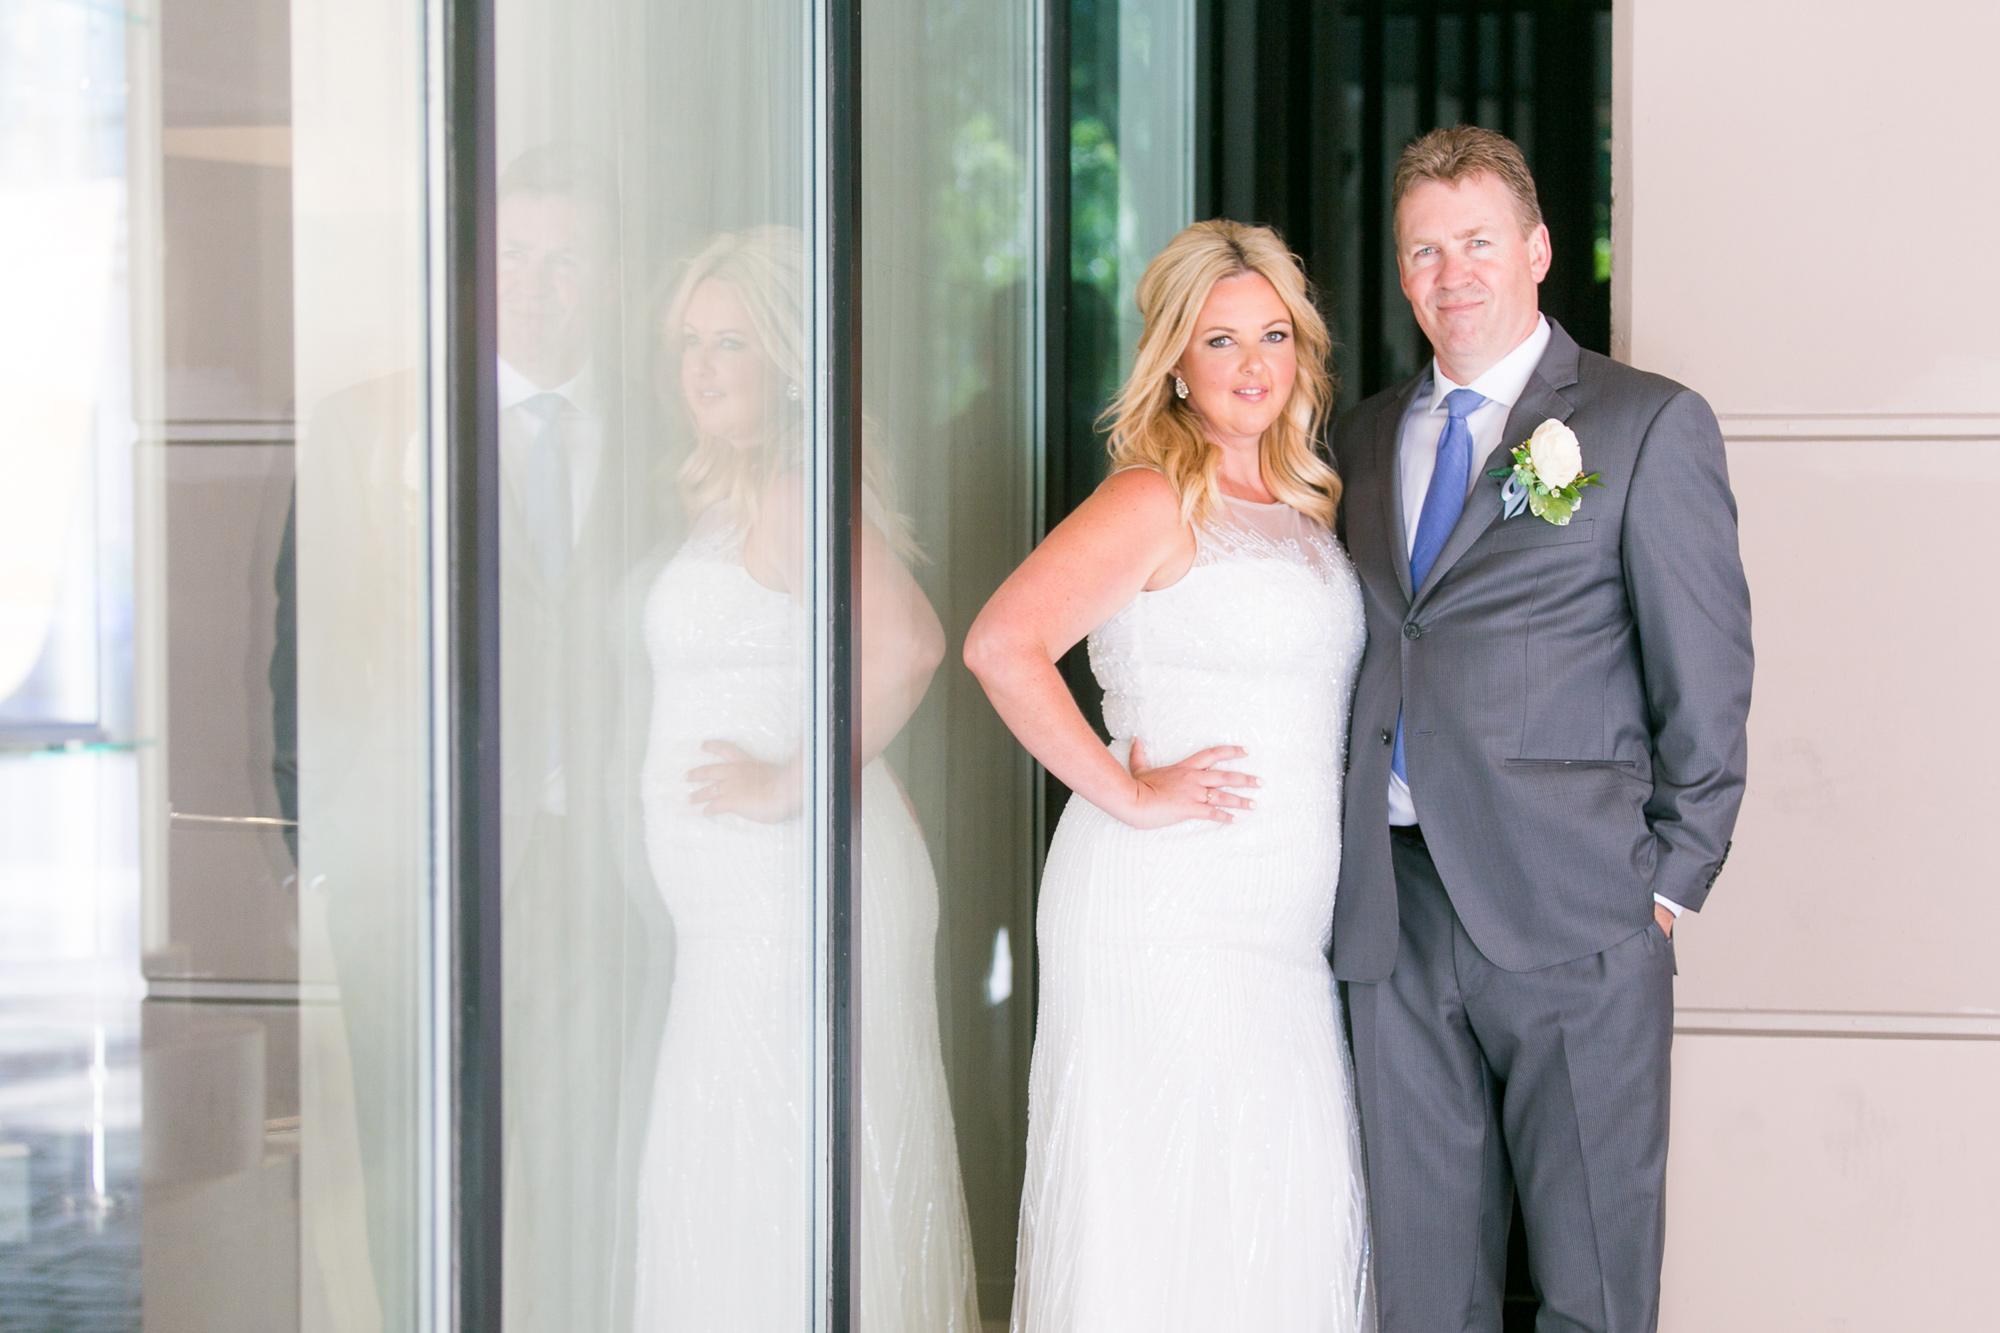 161-lord-nelson-wedding-------.jpg